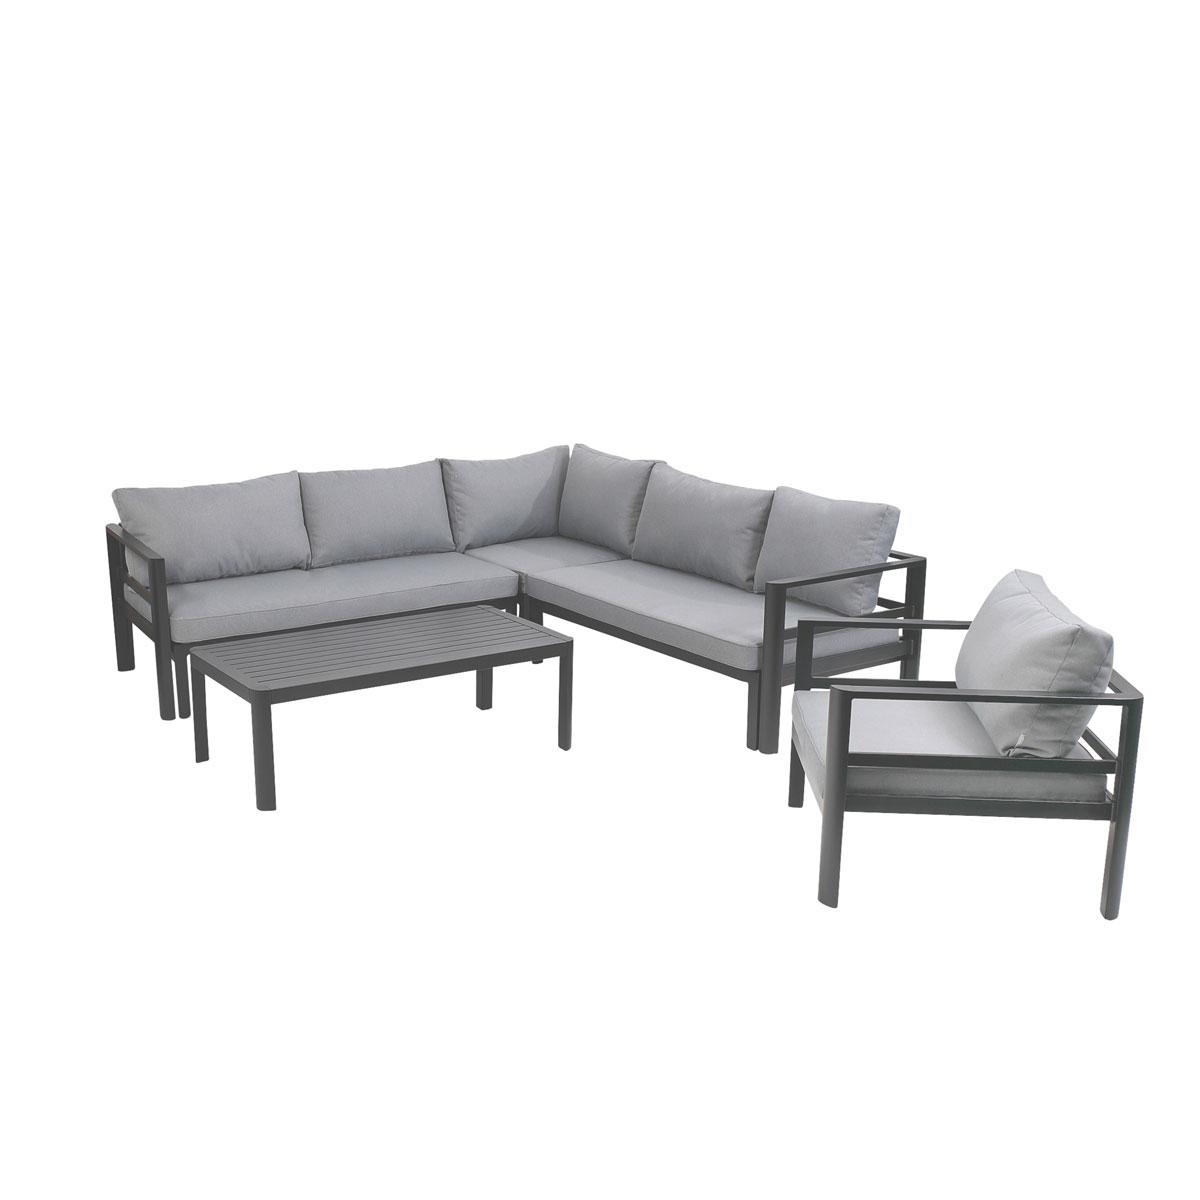 Loungemöbel - Lounge Set Levante, grau, inkl. Kissen  - Onlineshop Hellweg